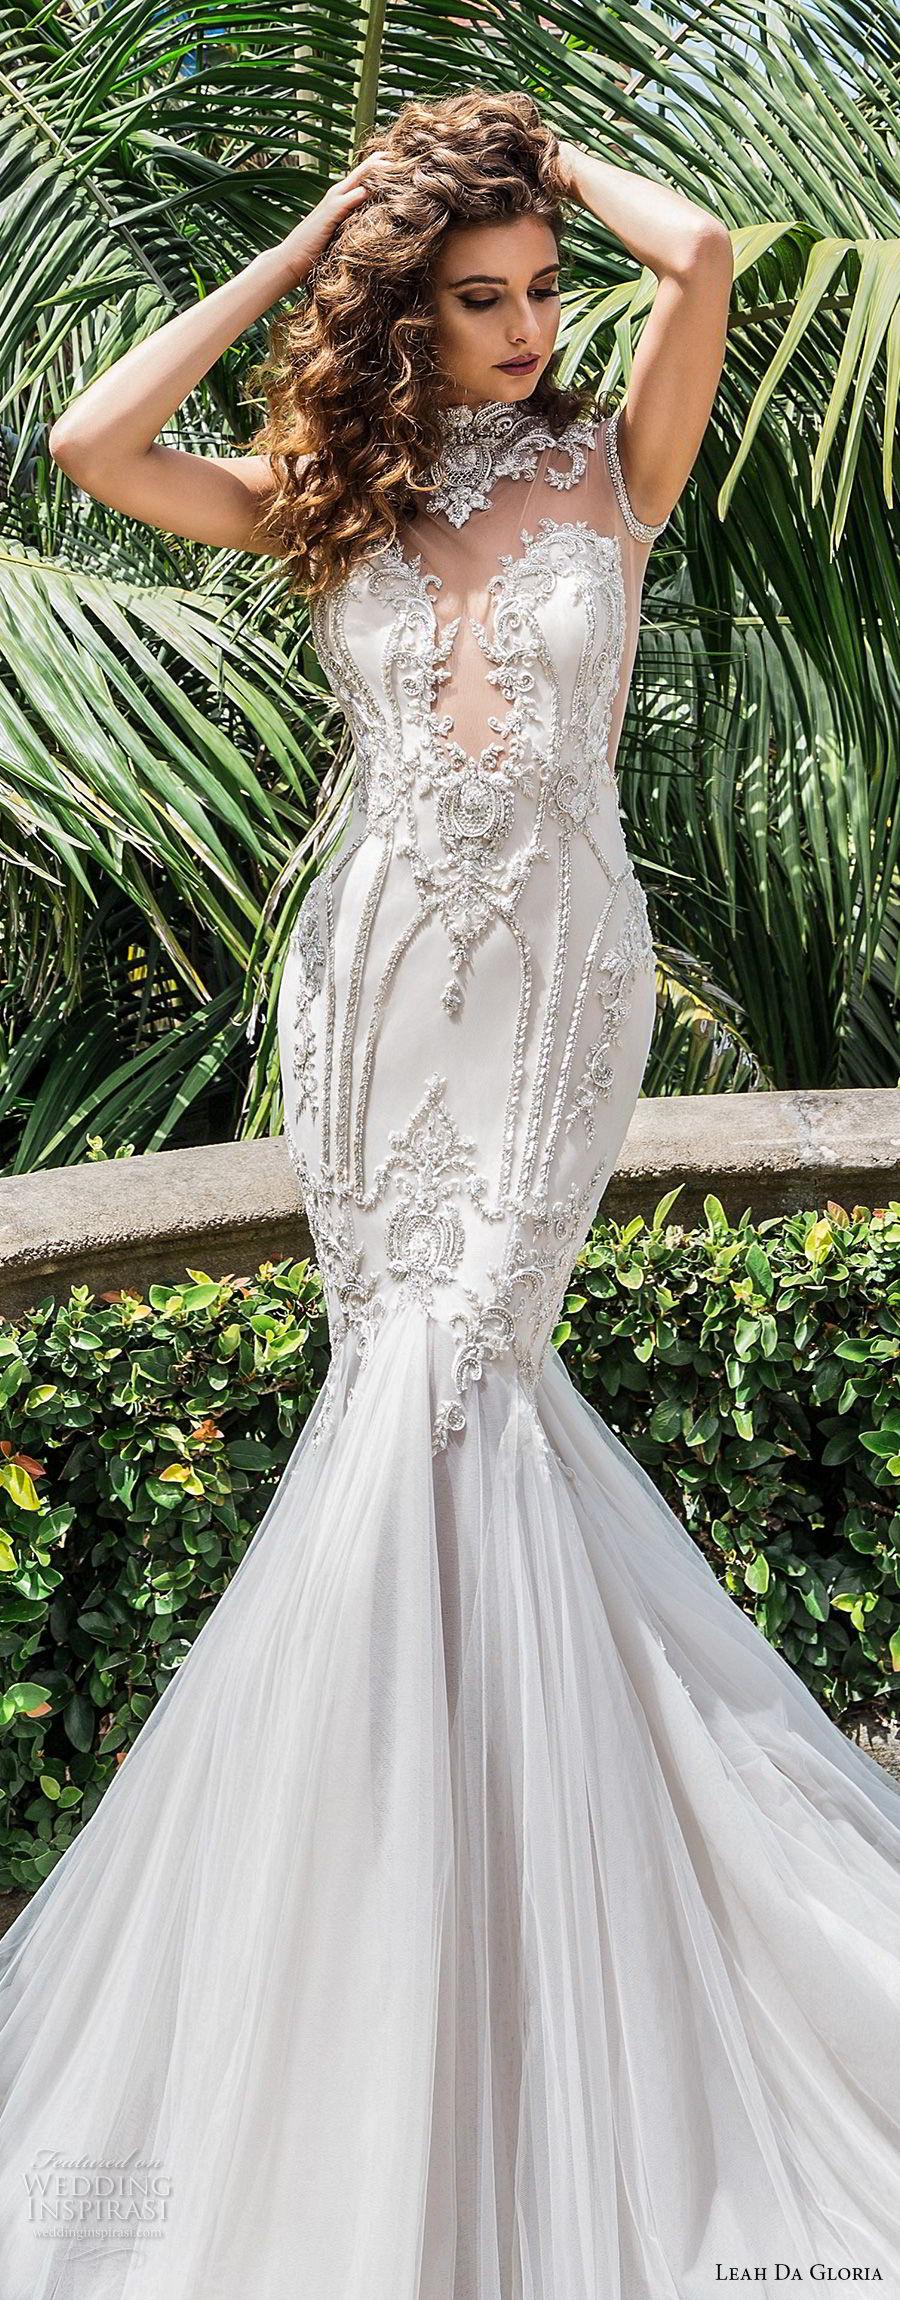 Leah Da Gloria 2017 Wedding Dresses Wedding Inspirasi